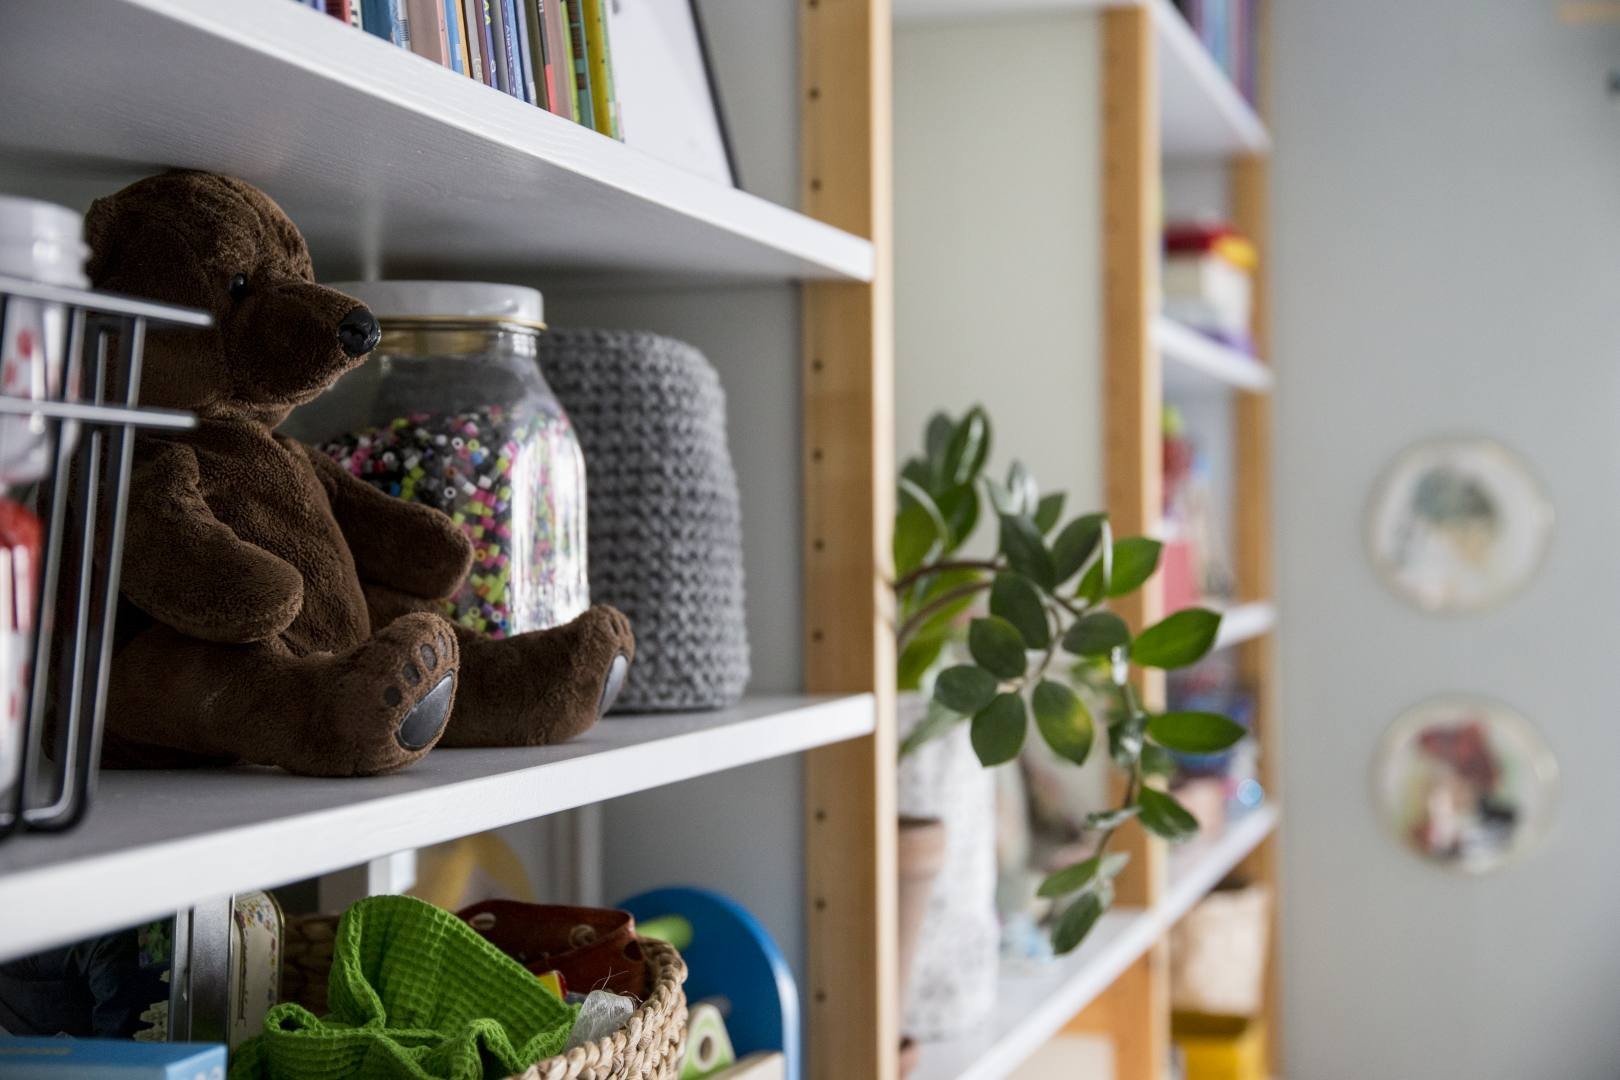 ©Lahiomutsi Lastenhuone Kidsroom Childrens Room Remontti Tapetti BarasTapeter Scandinavian Desigingers Mini, 6252 Charlie Linen Jade Lundia Entisointi-3907